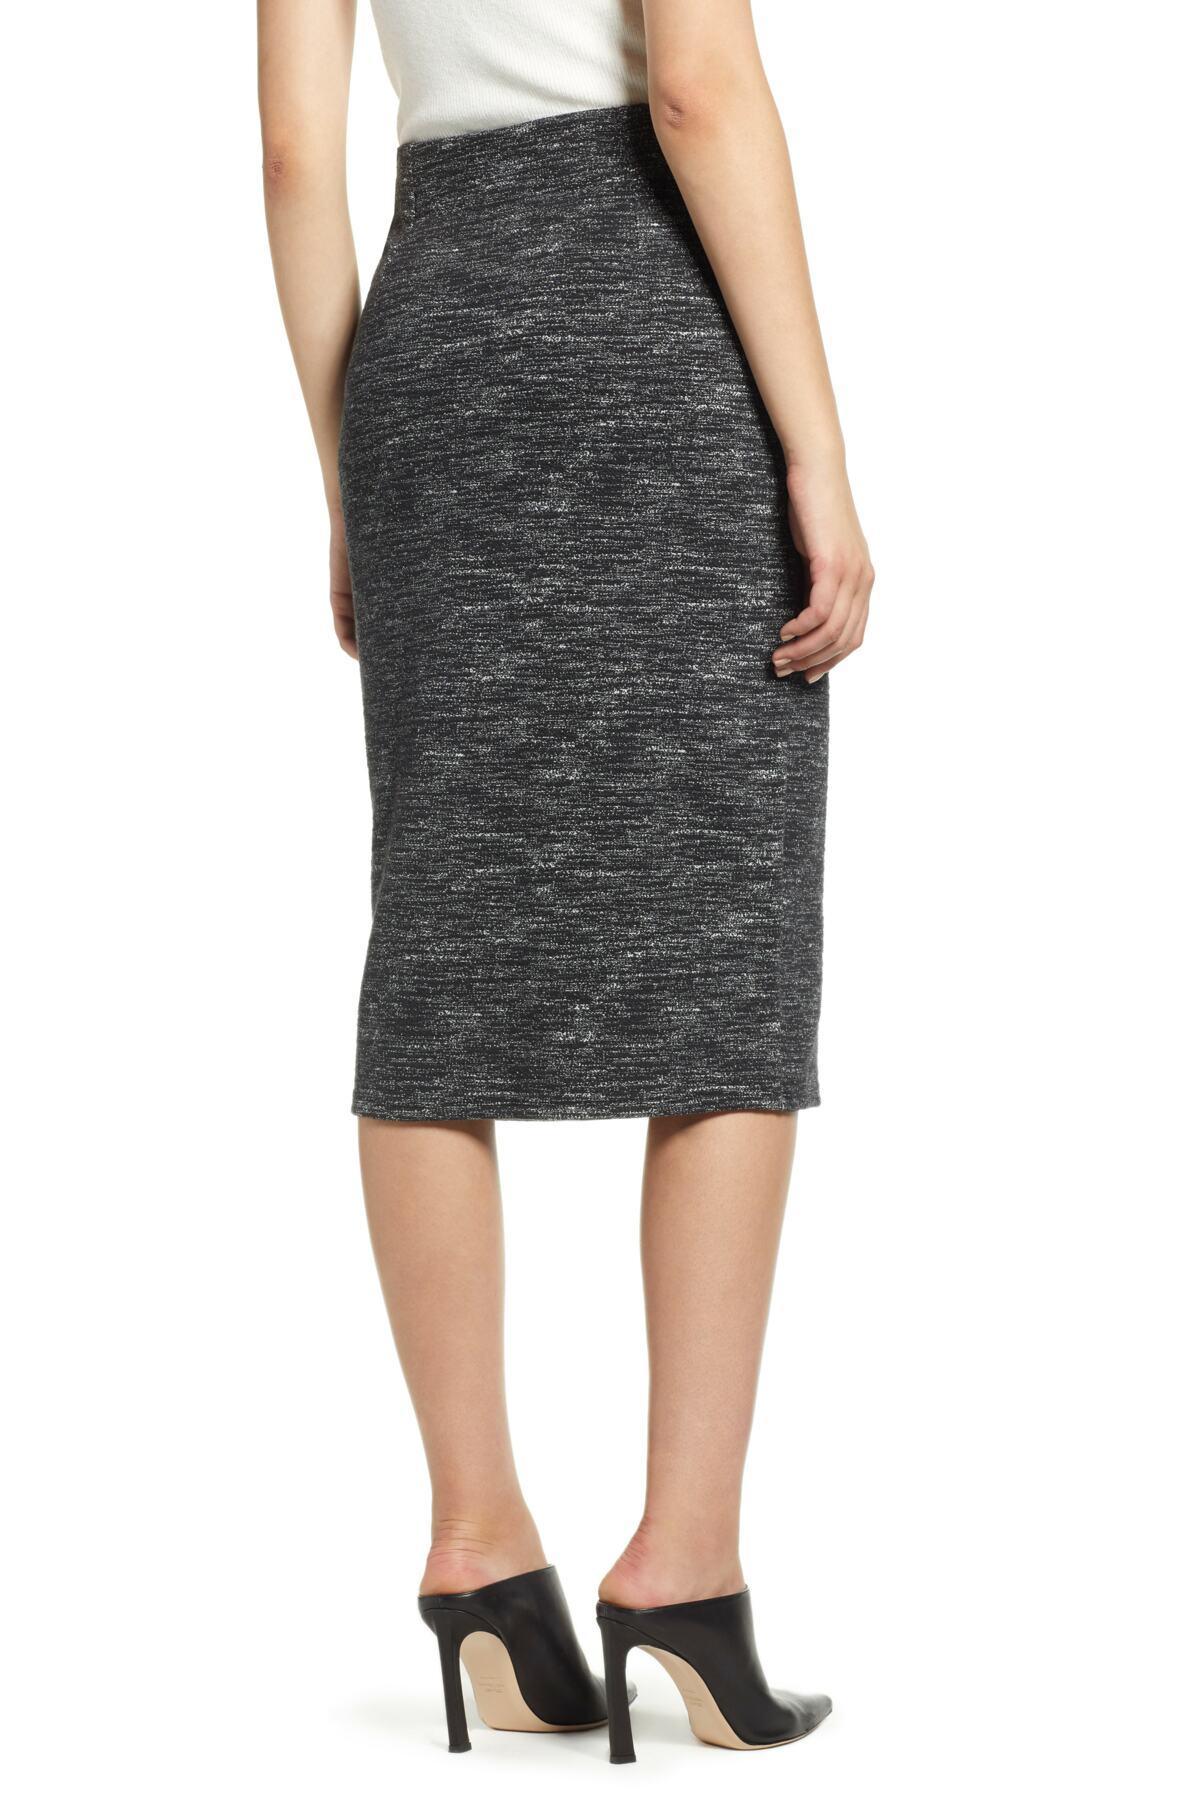 a37f00cdd Lyst - Halogen (r) Side Zip Ponte Pencil Skirt (regular & Petite) in ...